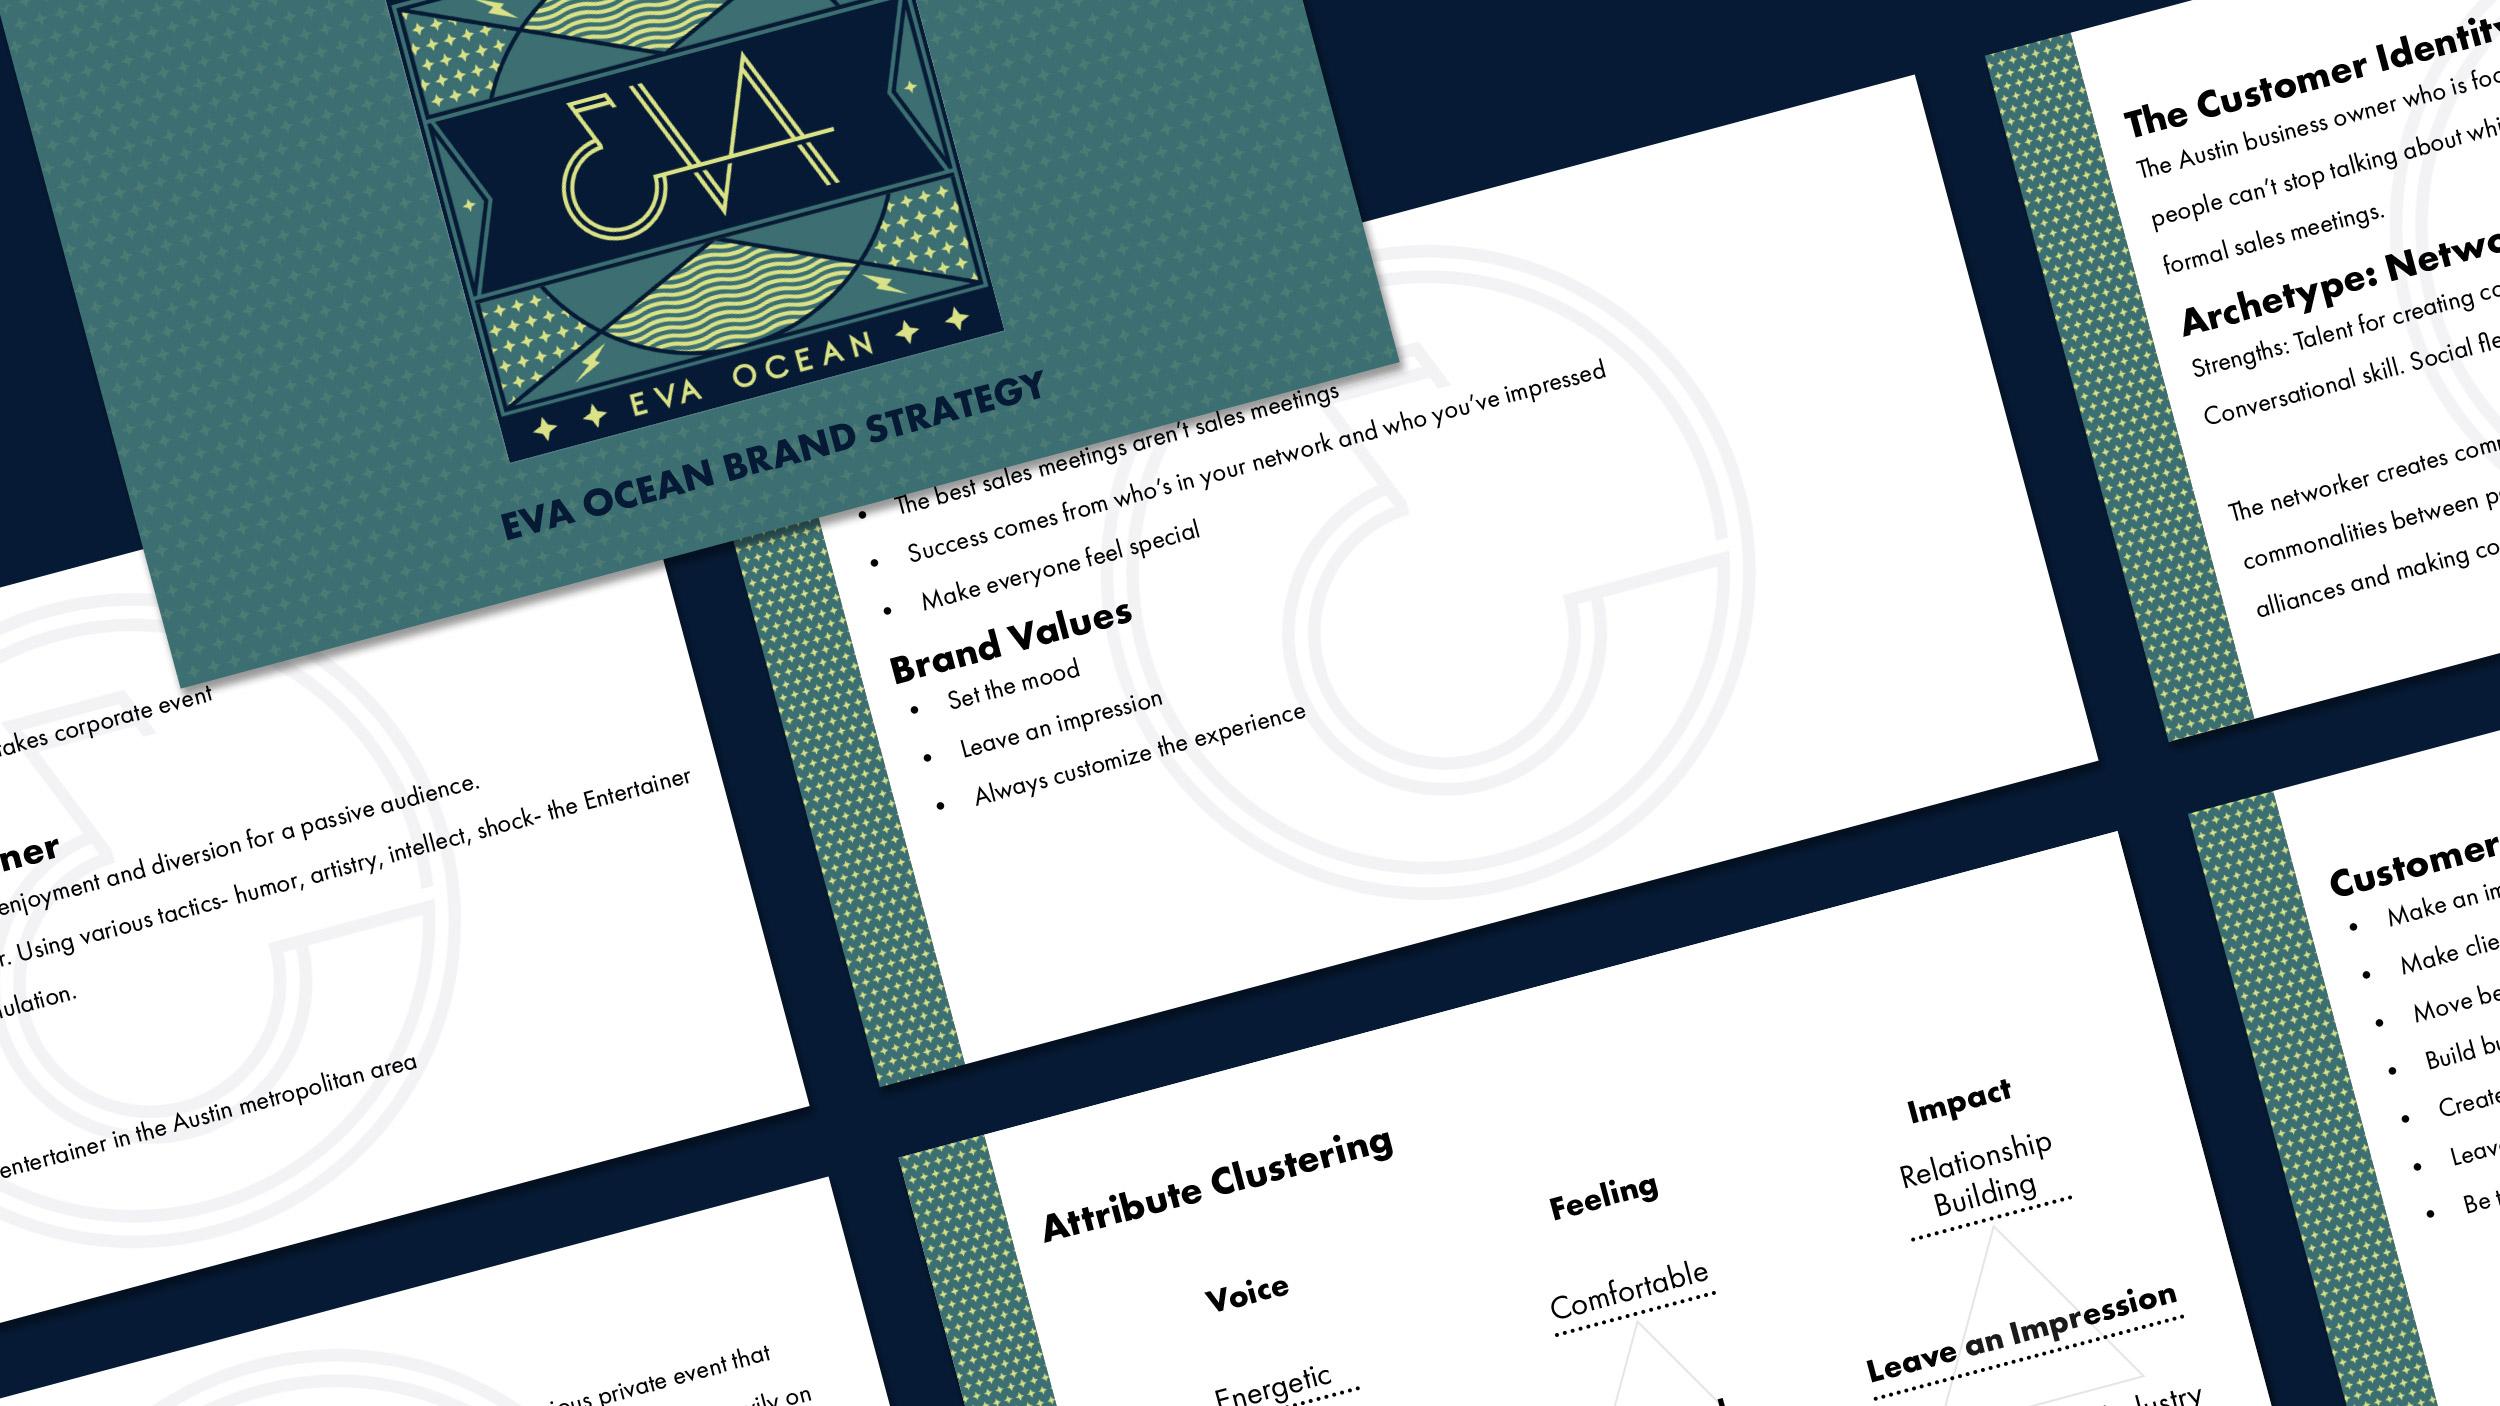 Eva Ocean Brand Strategy Guide